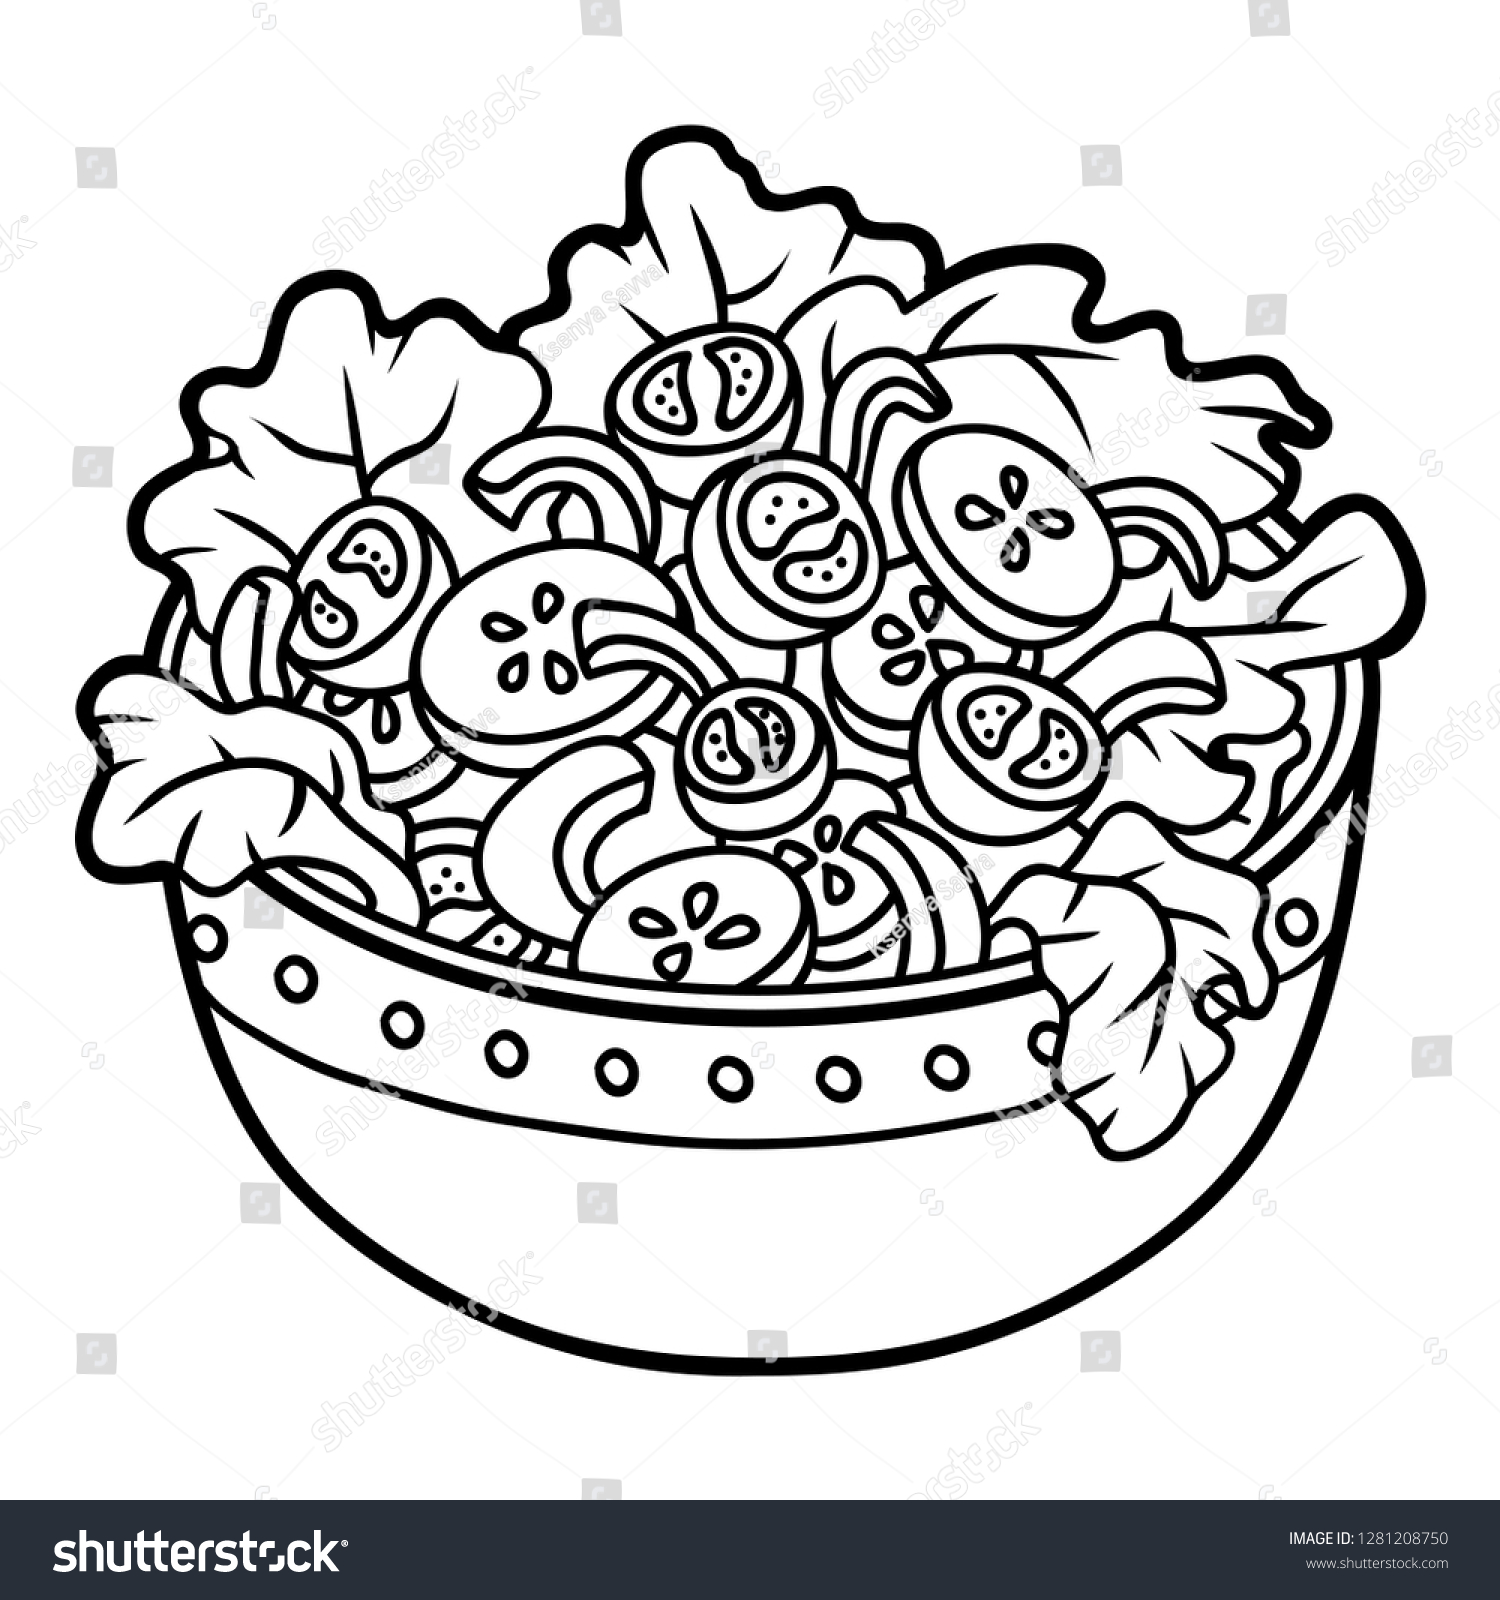 Coloring Book Children Vegetables Salad Bowl Stock Vector Royalty